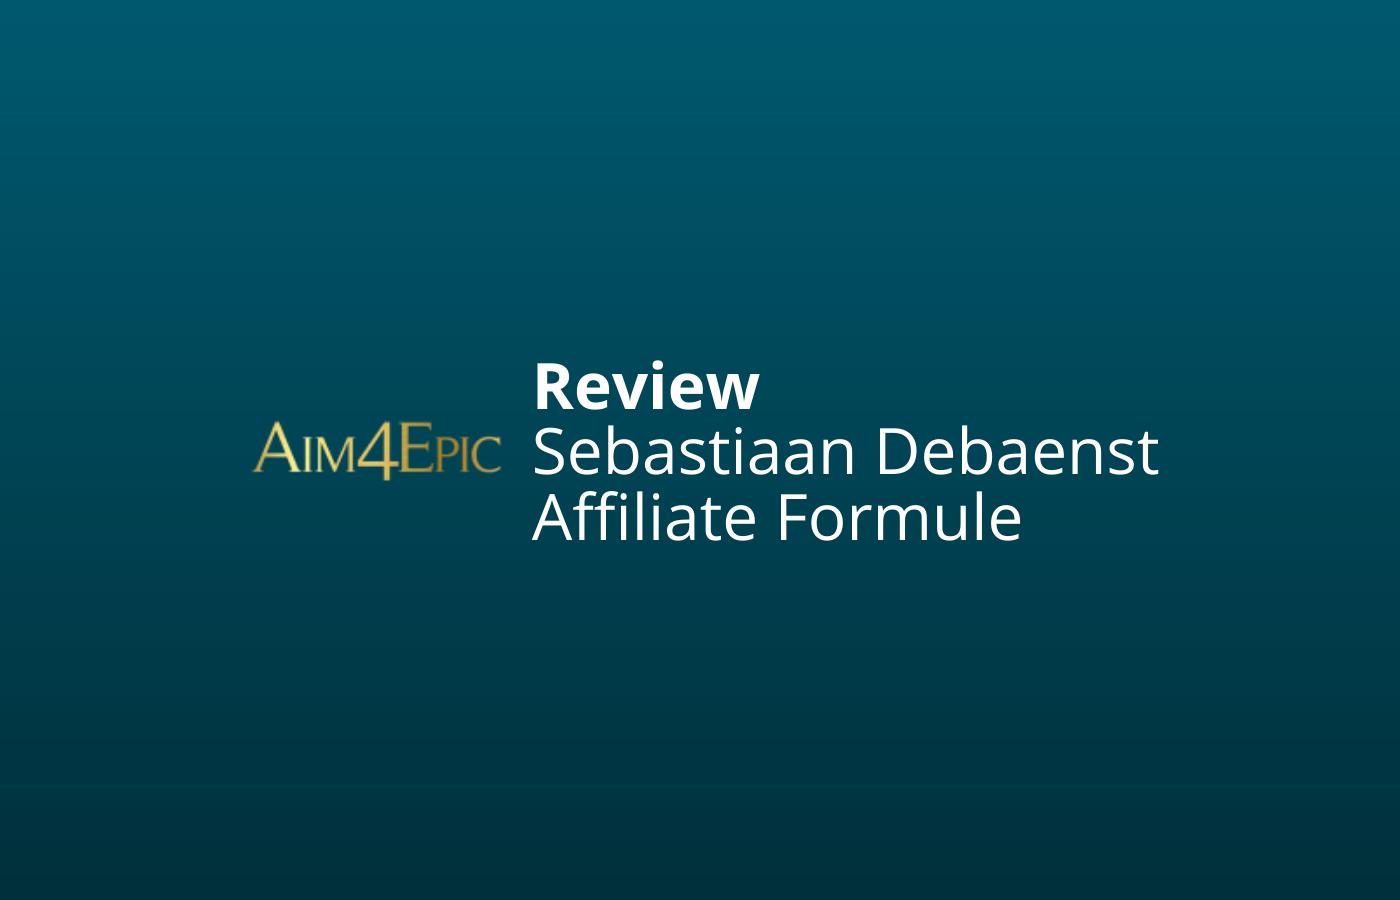 Sebastiaan Debaenst review ervaringen